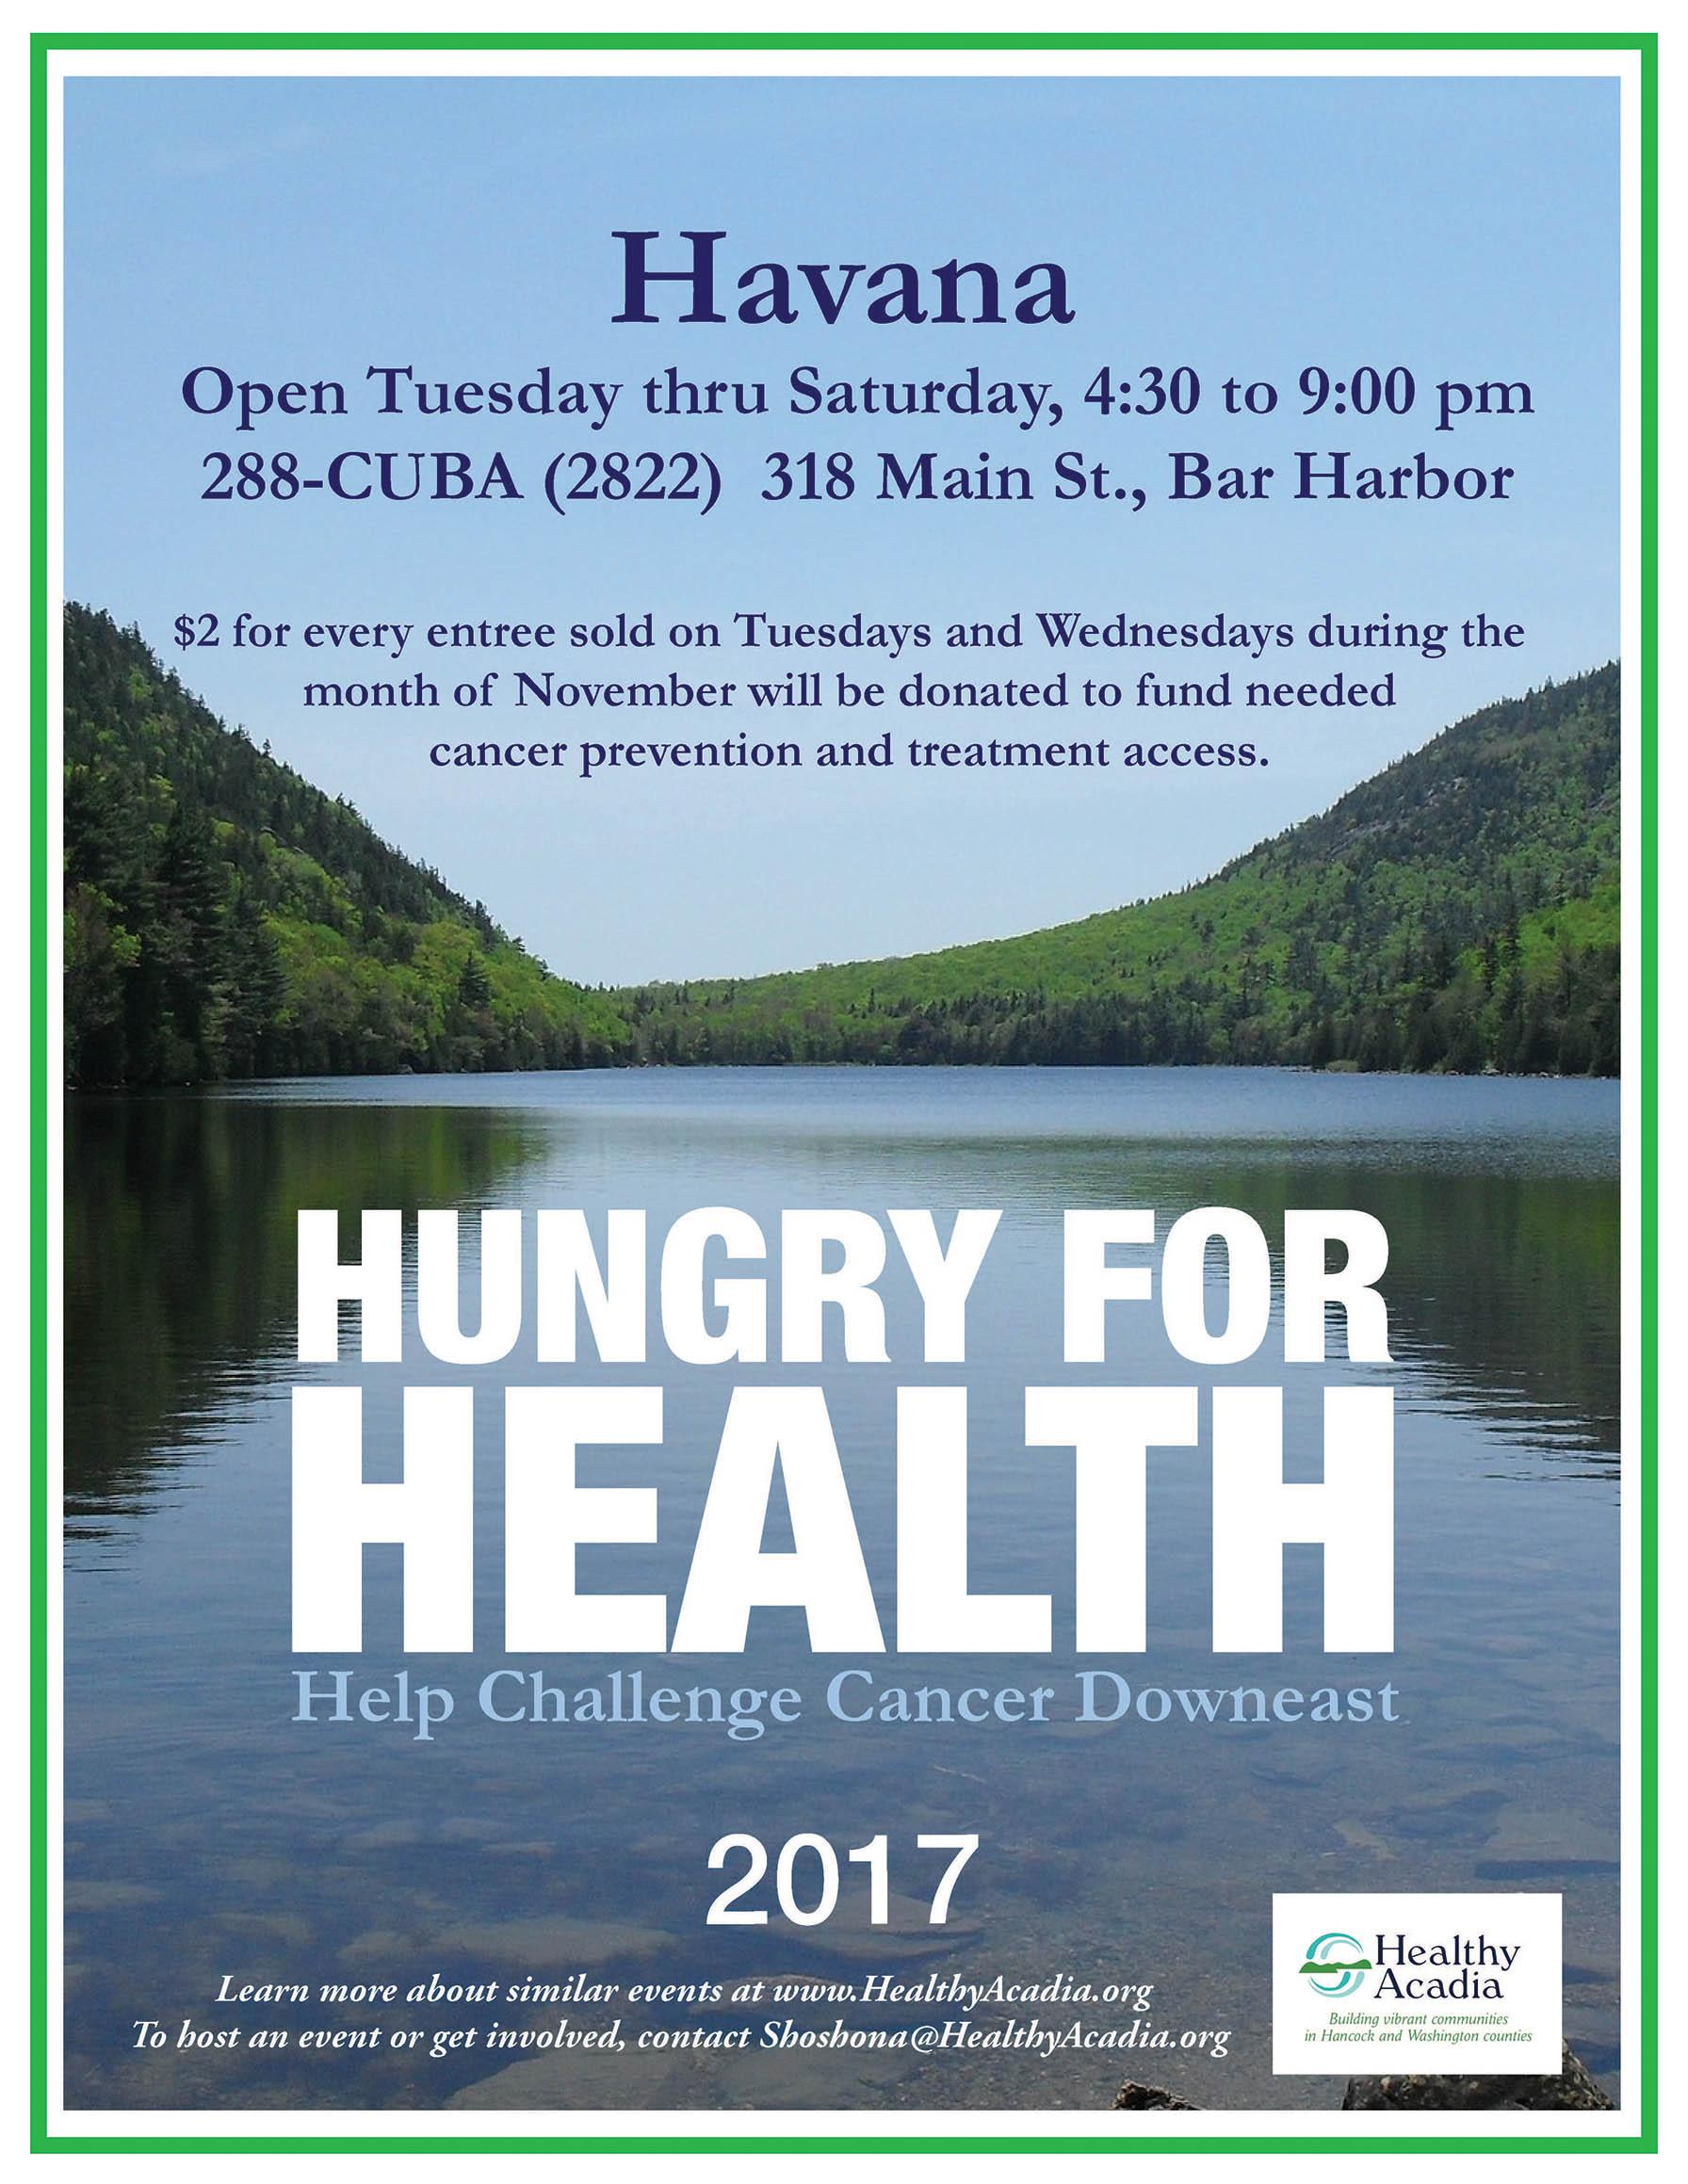 Havana Hungry for Health 2017 small pic.jpg